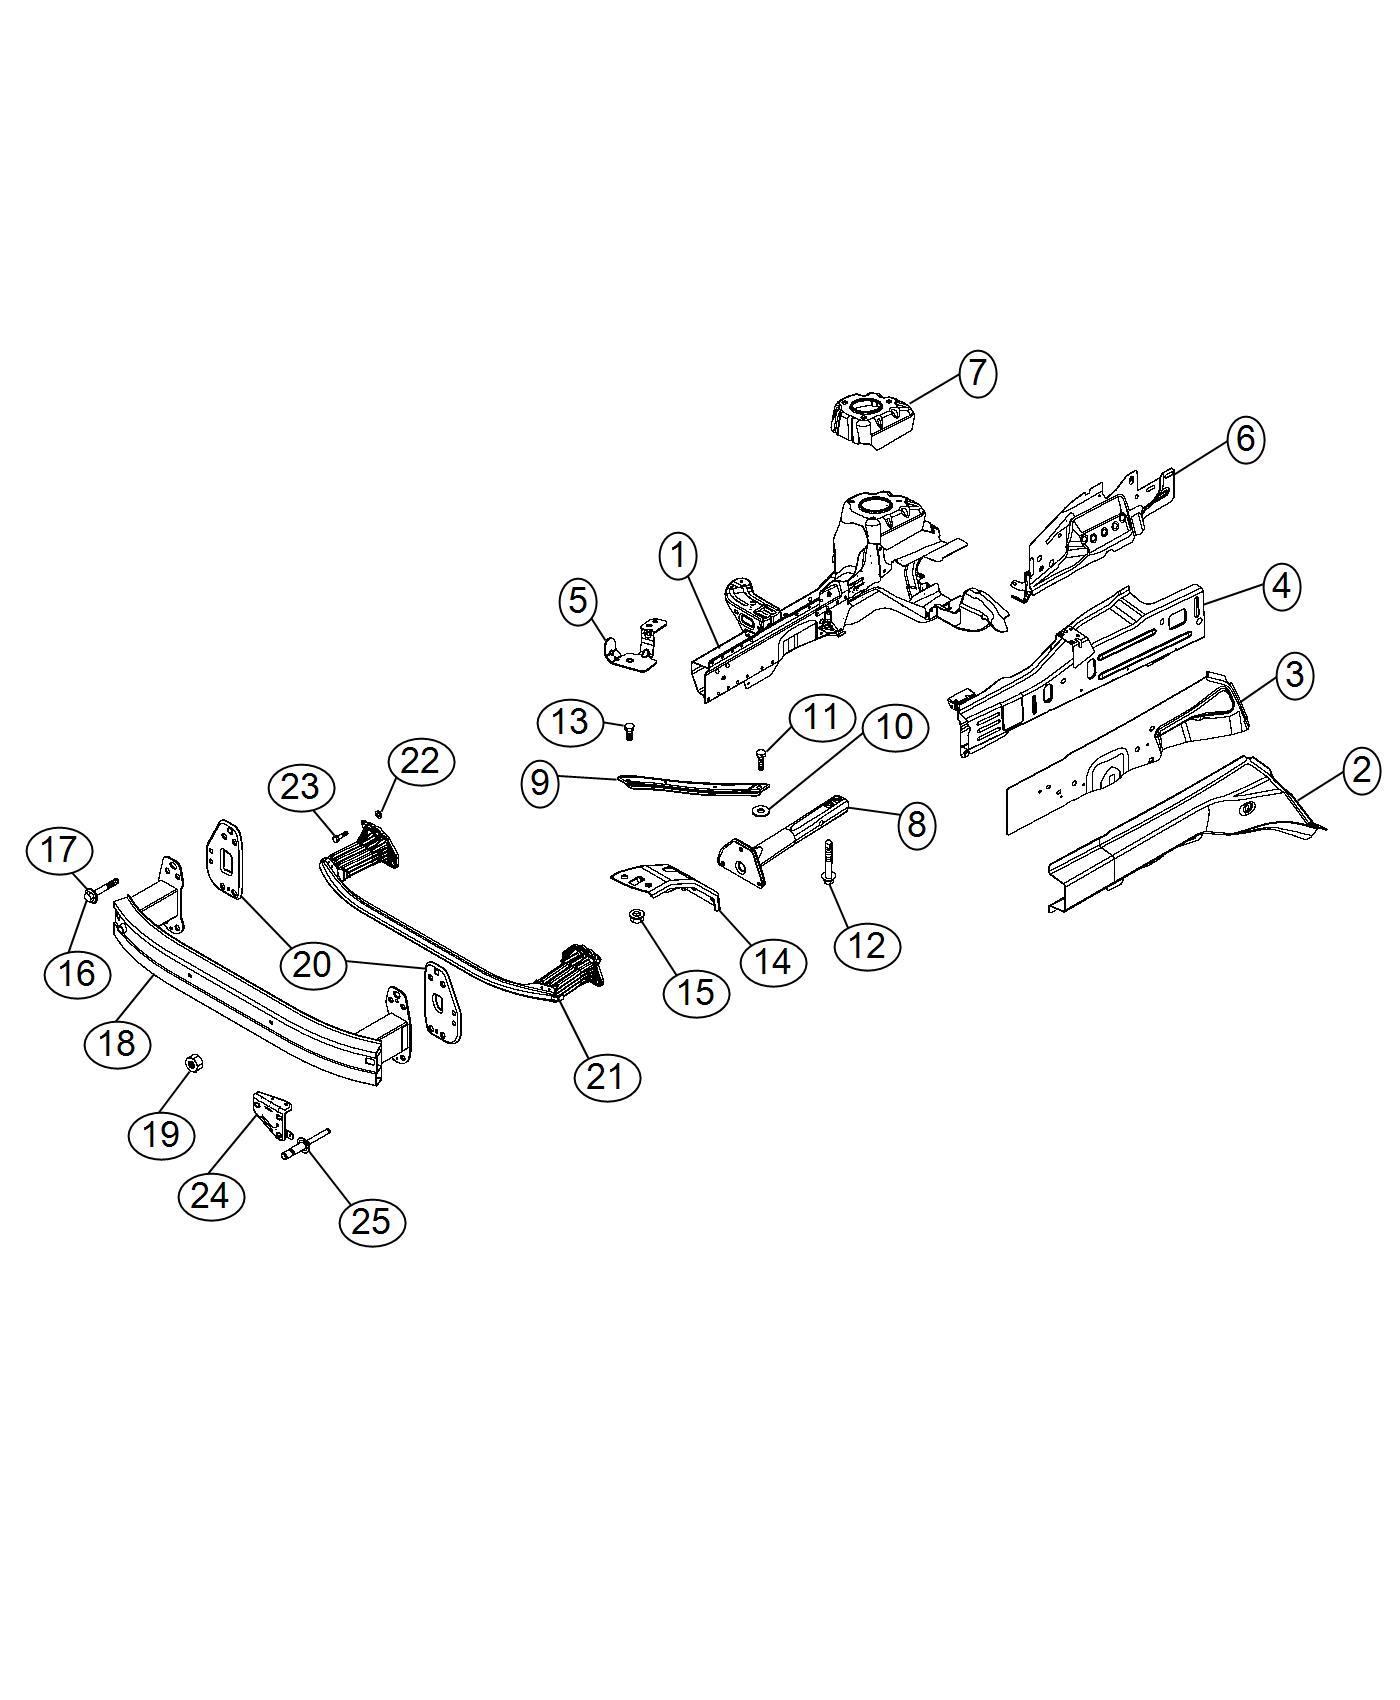 2015 jeep renegade bracket  forward collision warning  export   full speed fwd collision warn